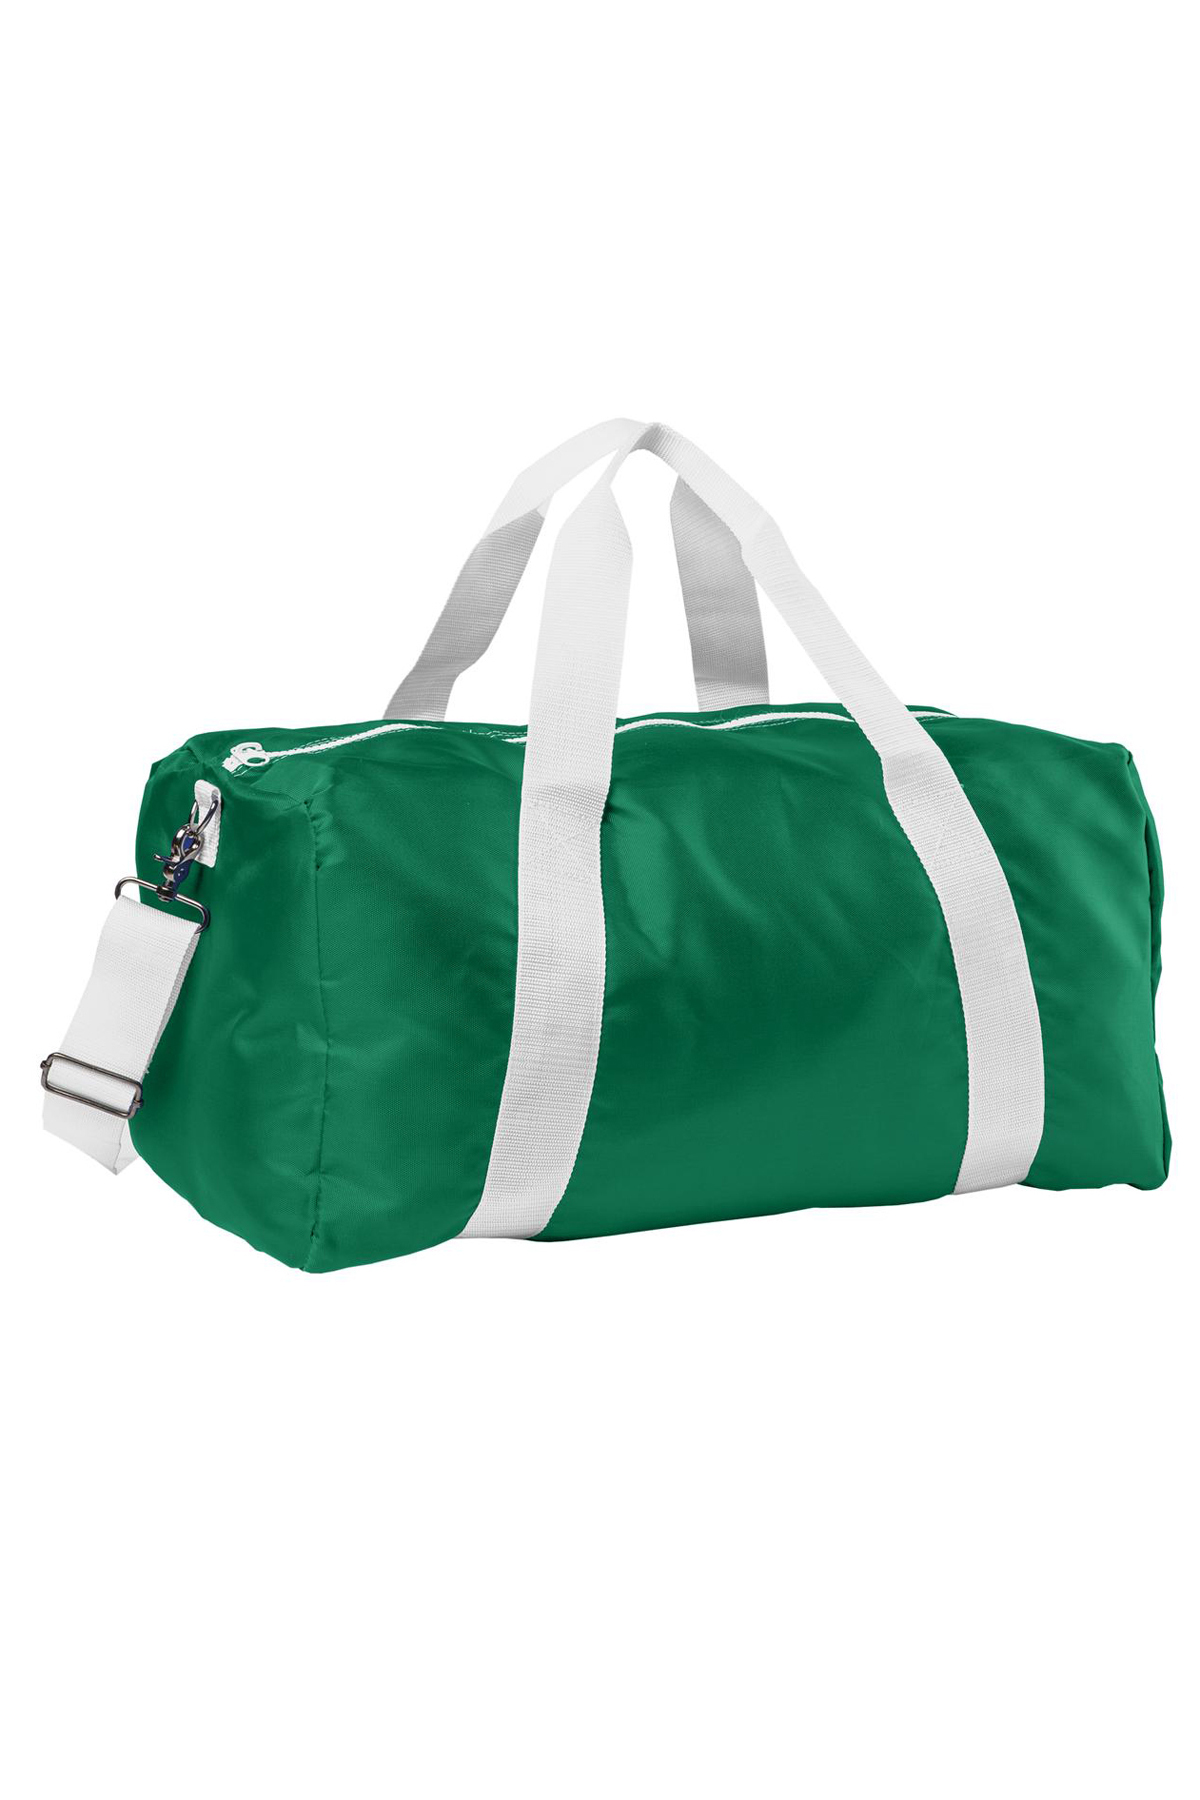 Bags-Duffels-23